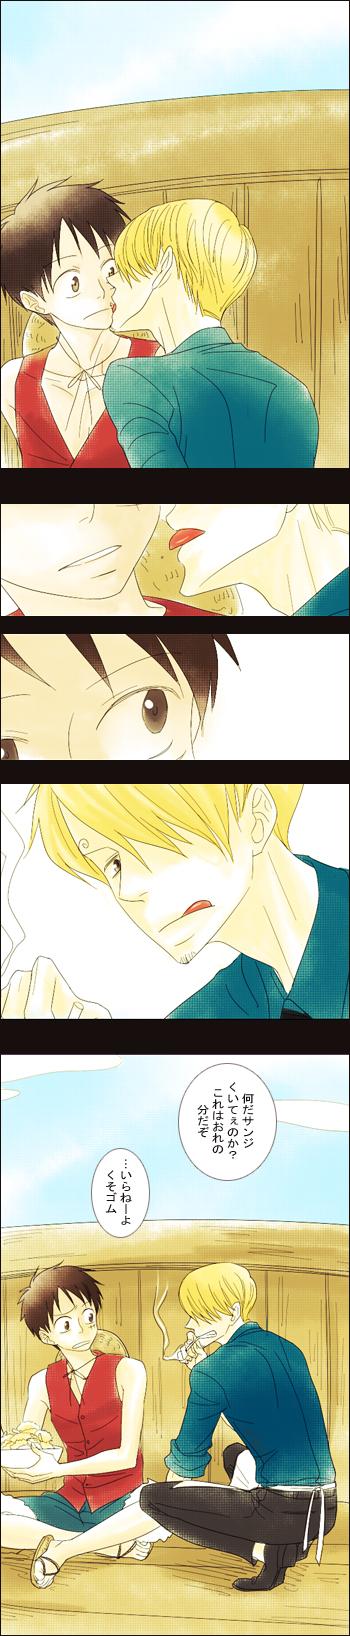 Tags: Anime, ONE PIECE, Monkey D. Luffy, Sanji, Artist Request, LuSan, Straw Hat Pirates